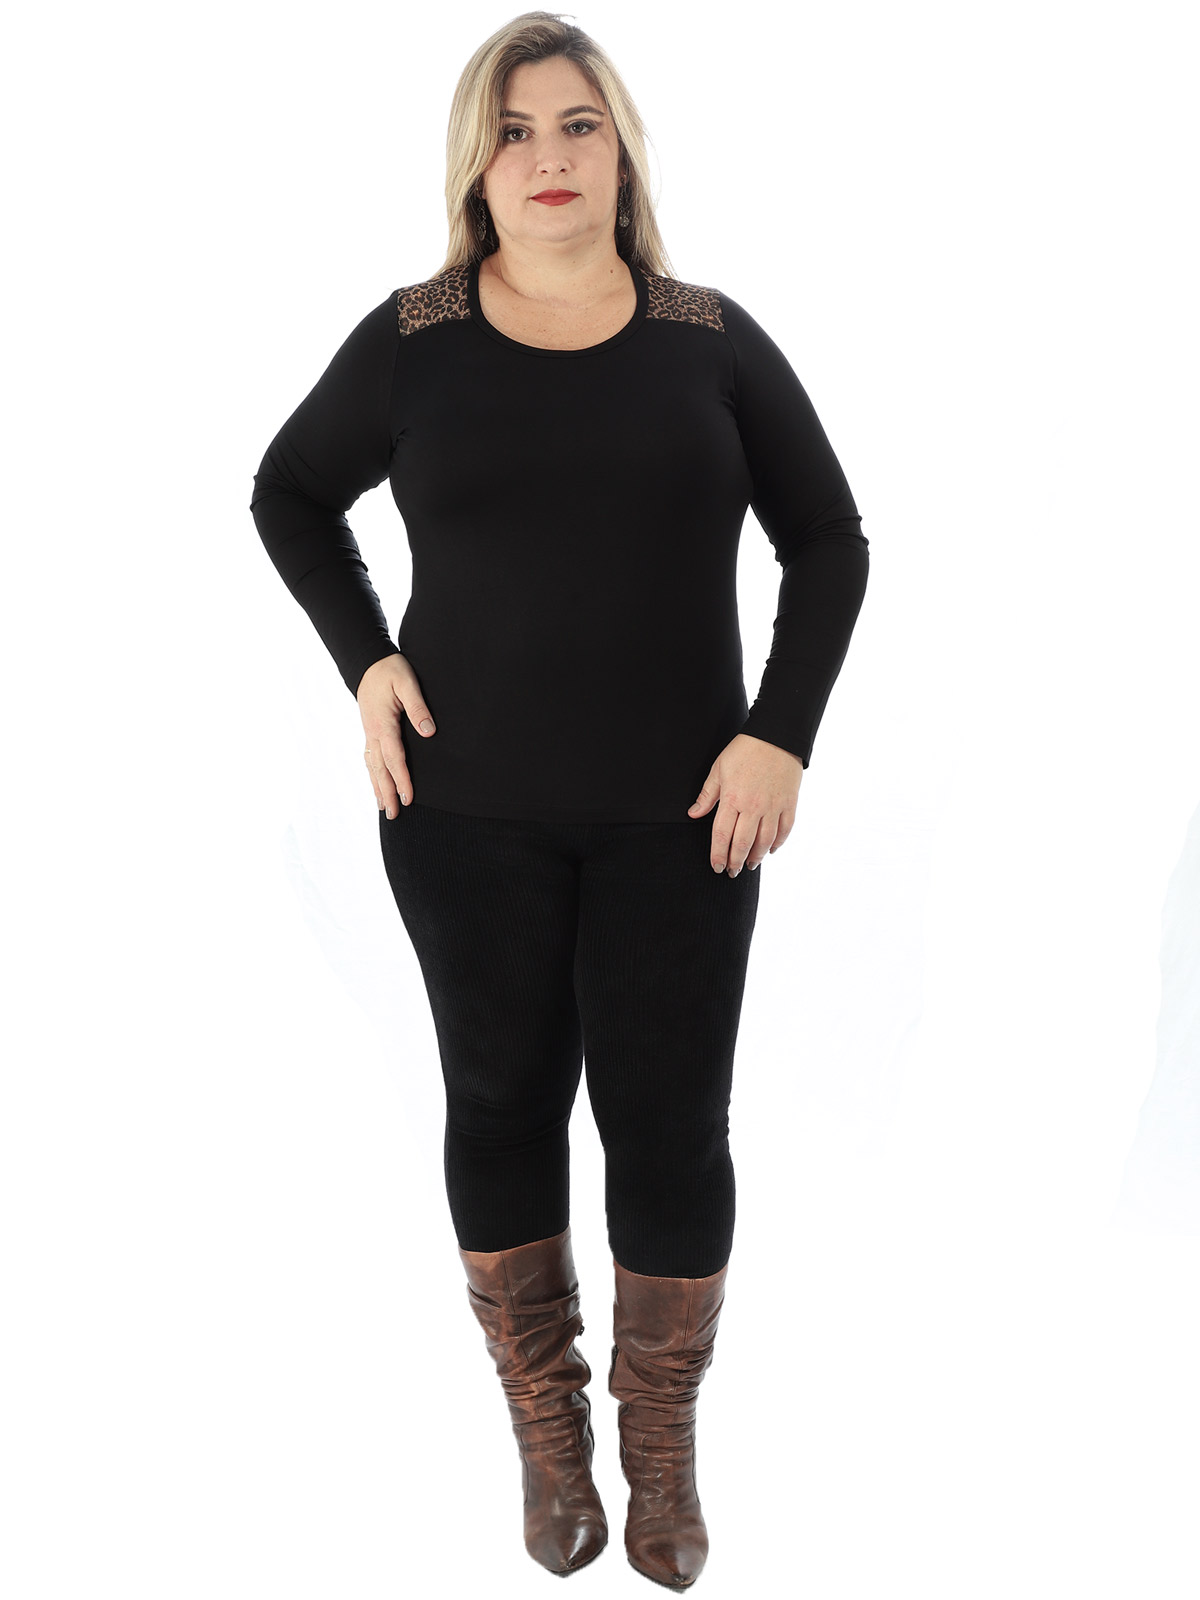 Blusa Plus Size Feminina Com Tule Estampado Anistia Preta